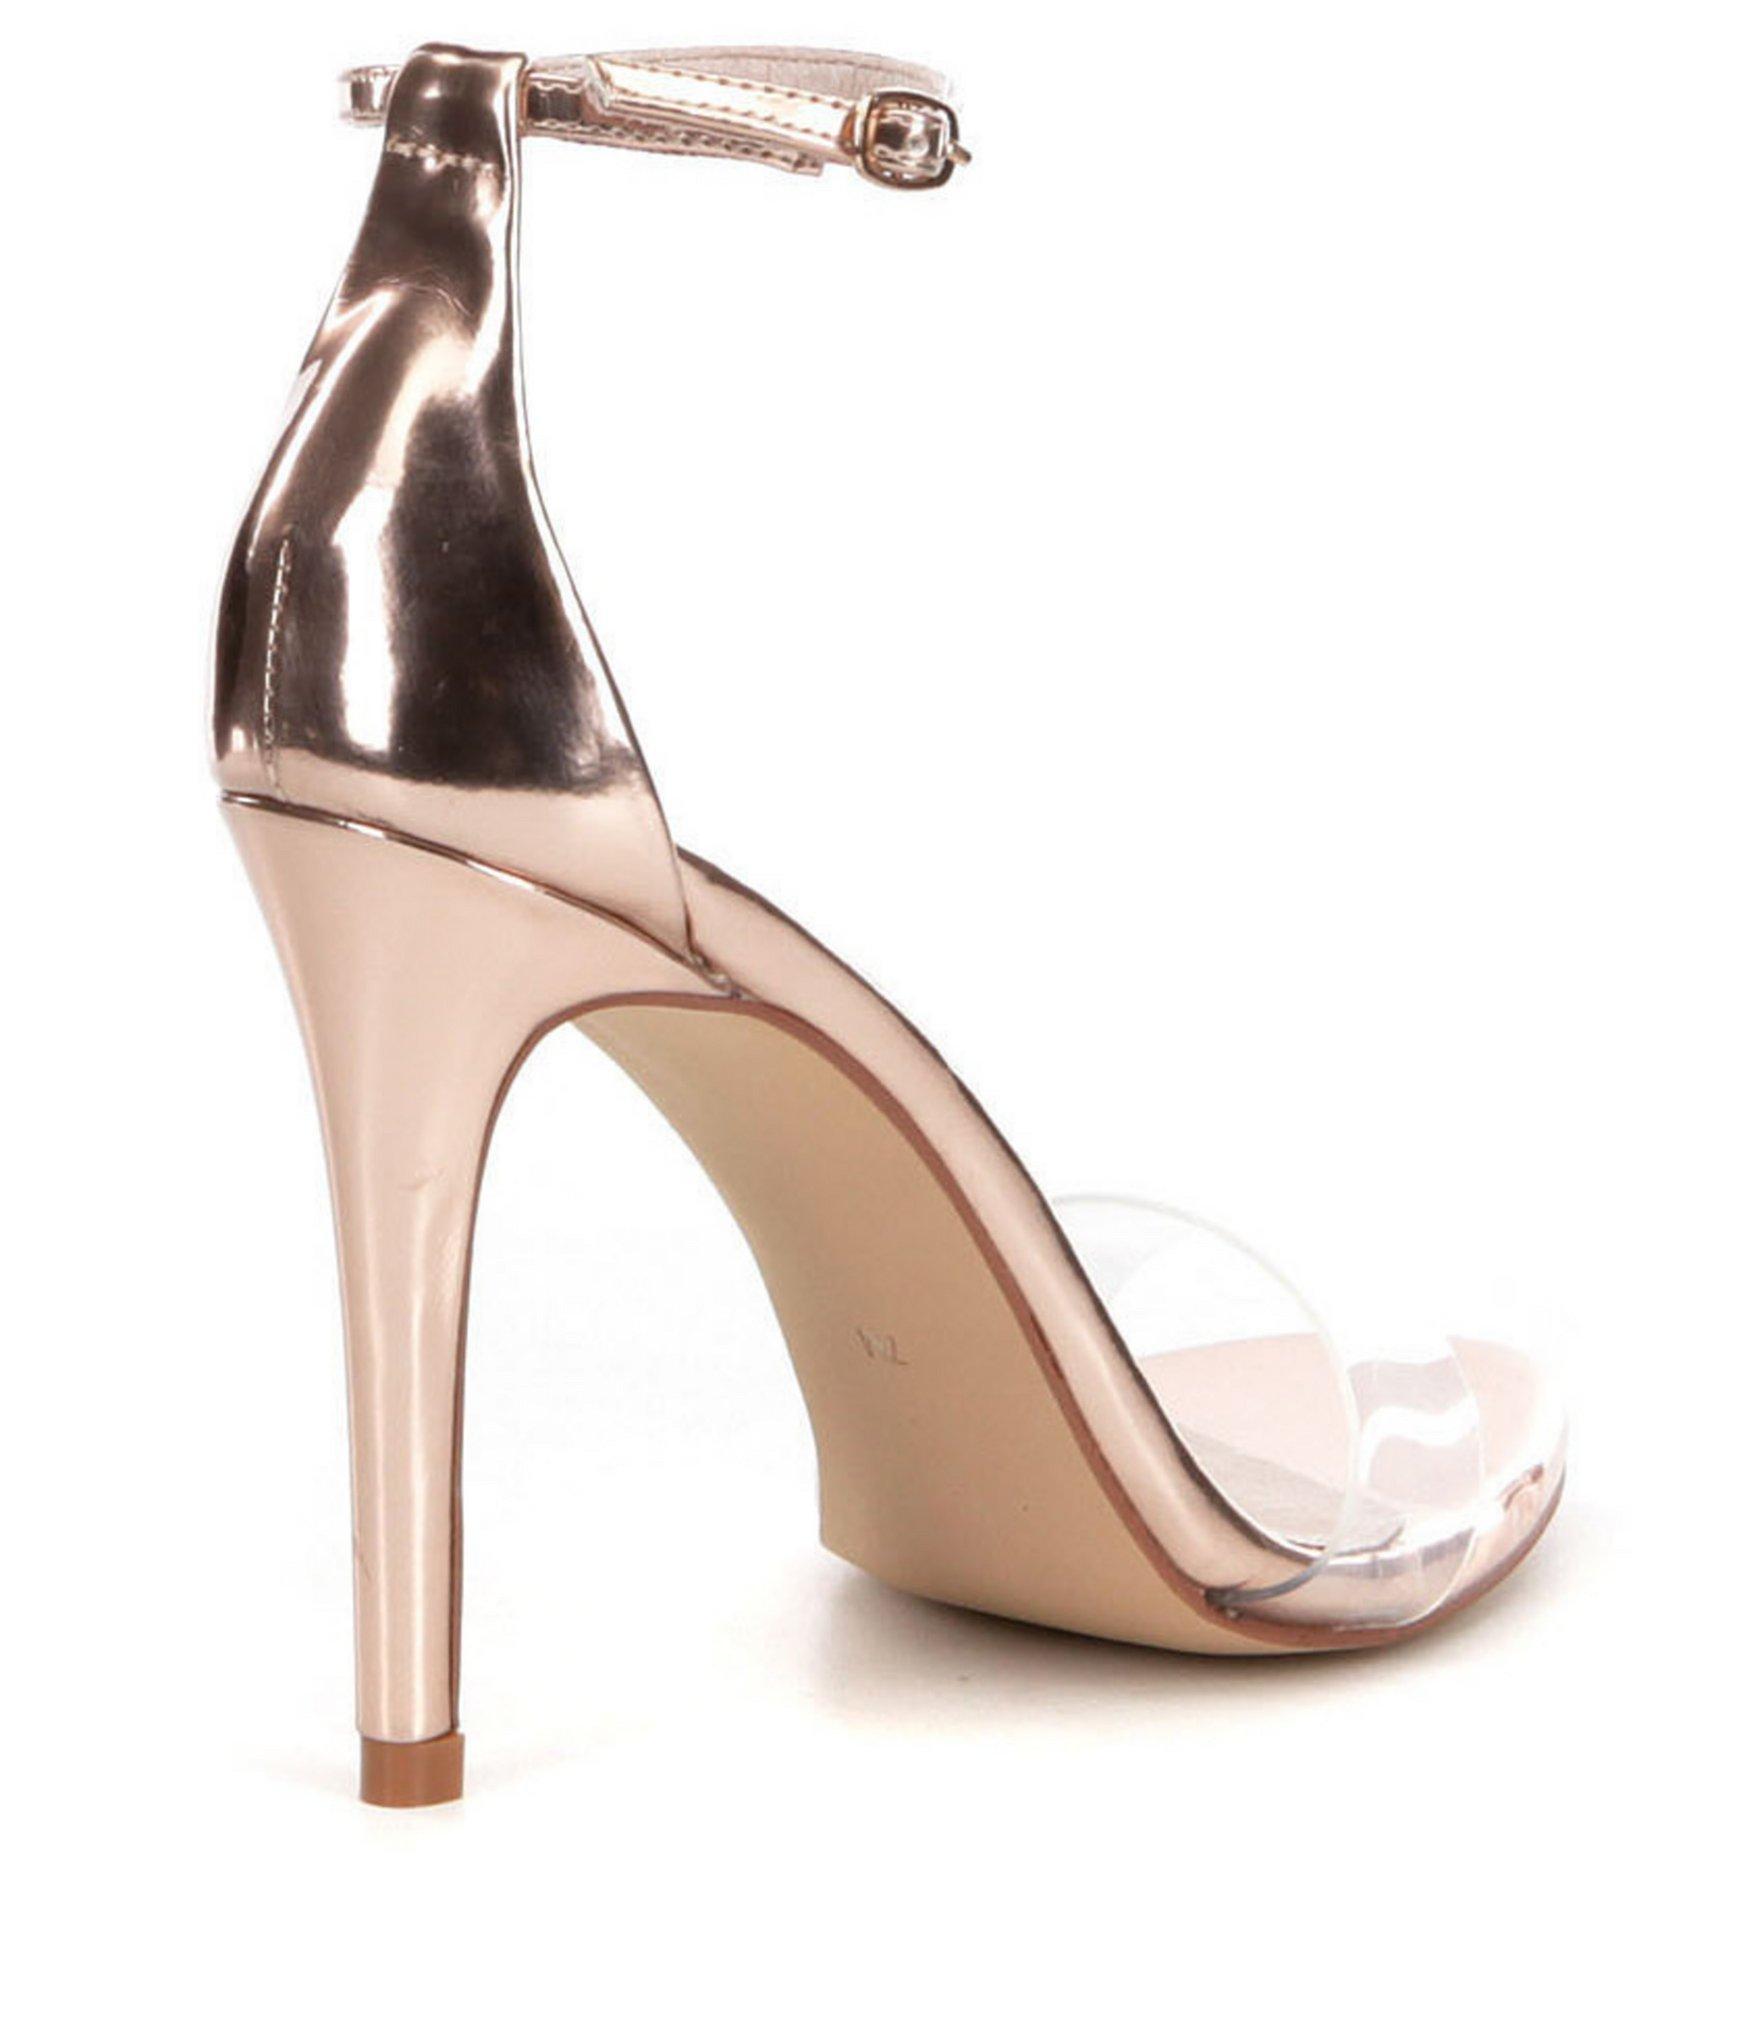 8715a1da1e9 Steve Madden Multicolor Stecy-c Ankle Strap Lucite Dress Sandals